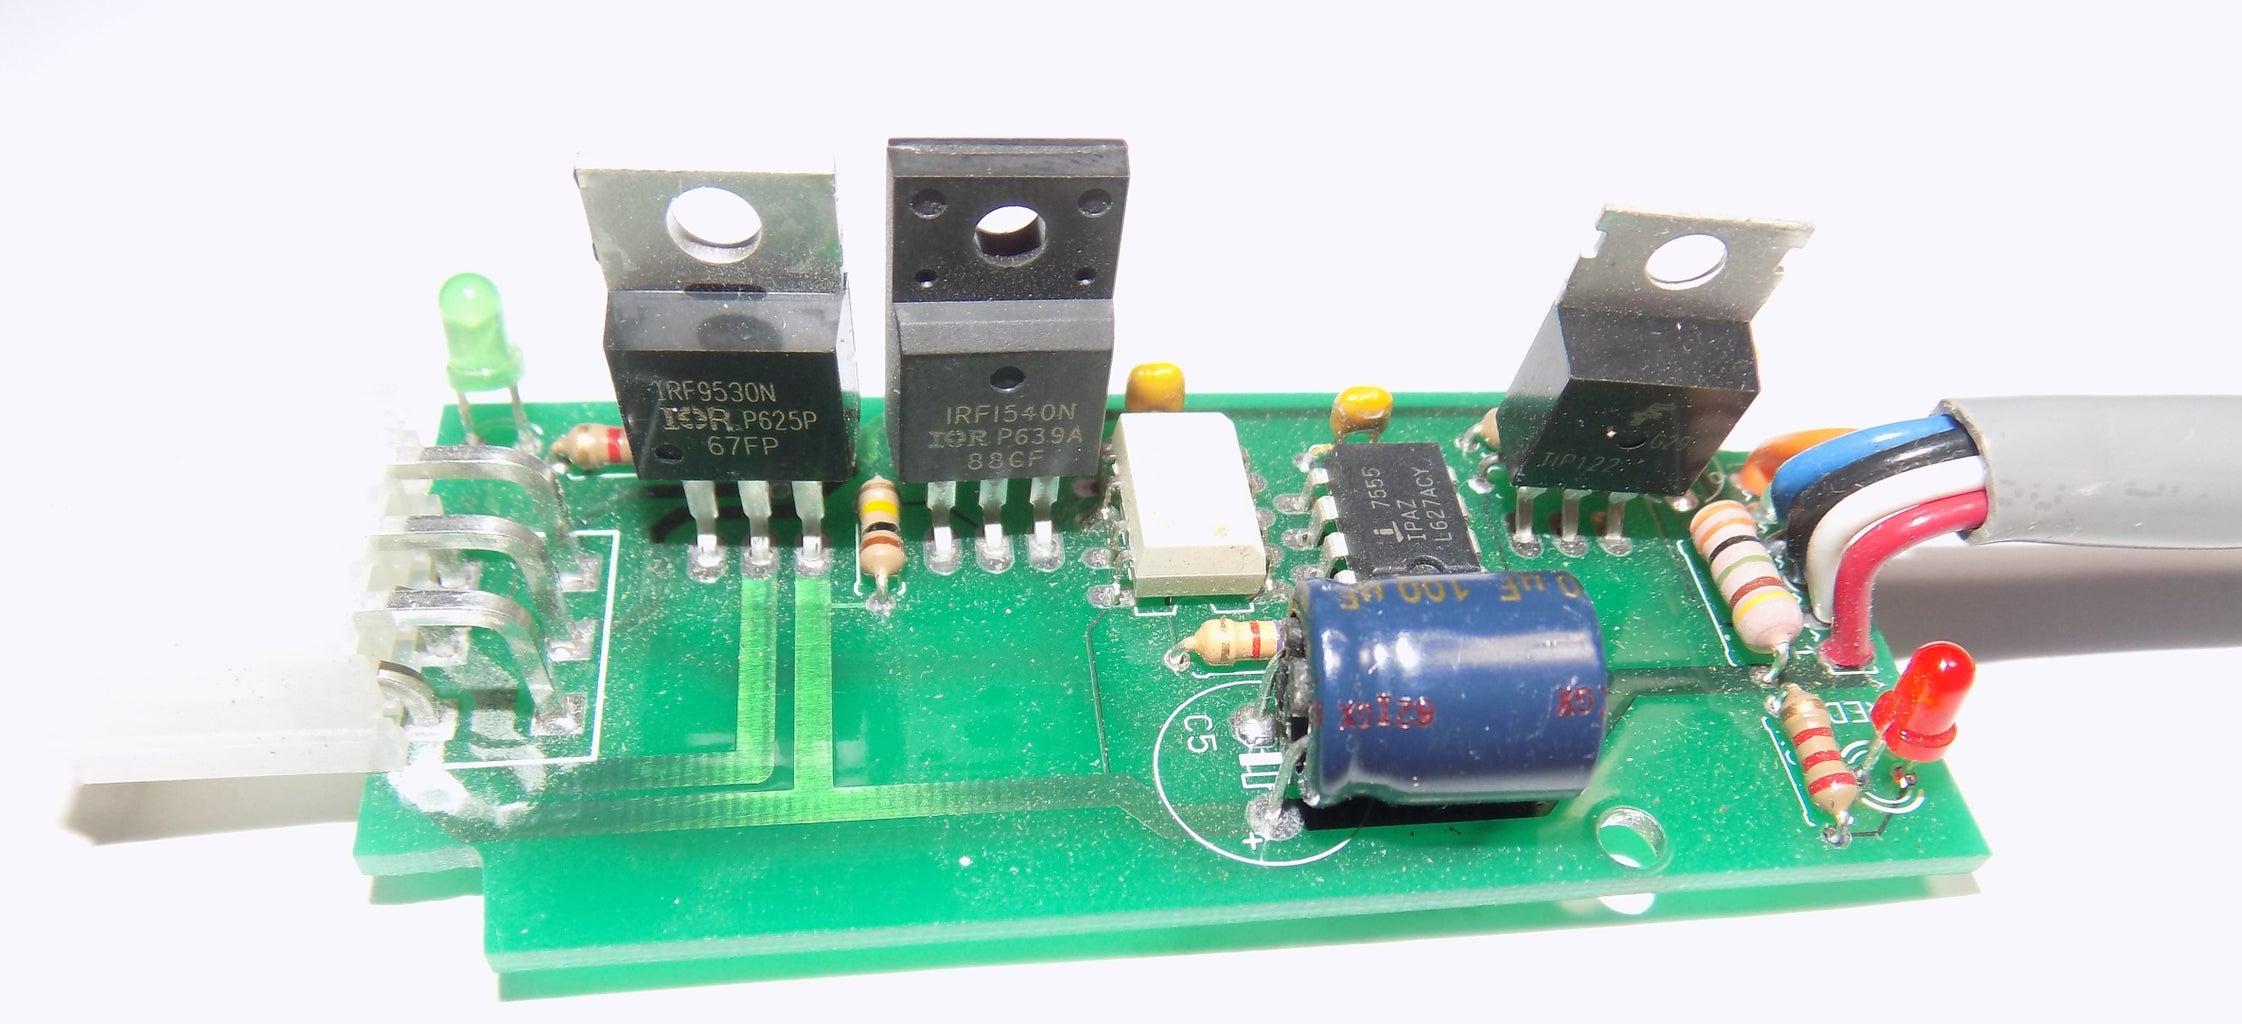 Circuit Description and Operation